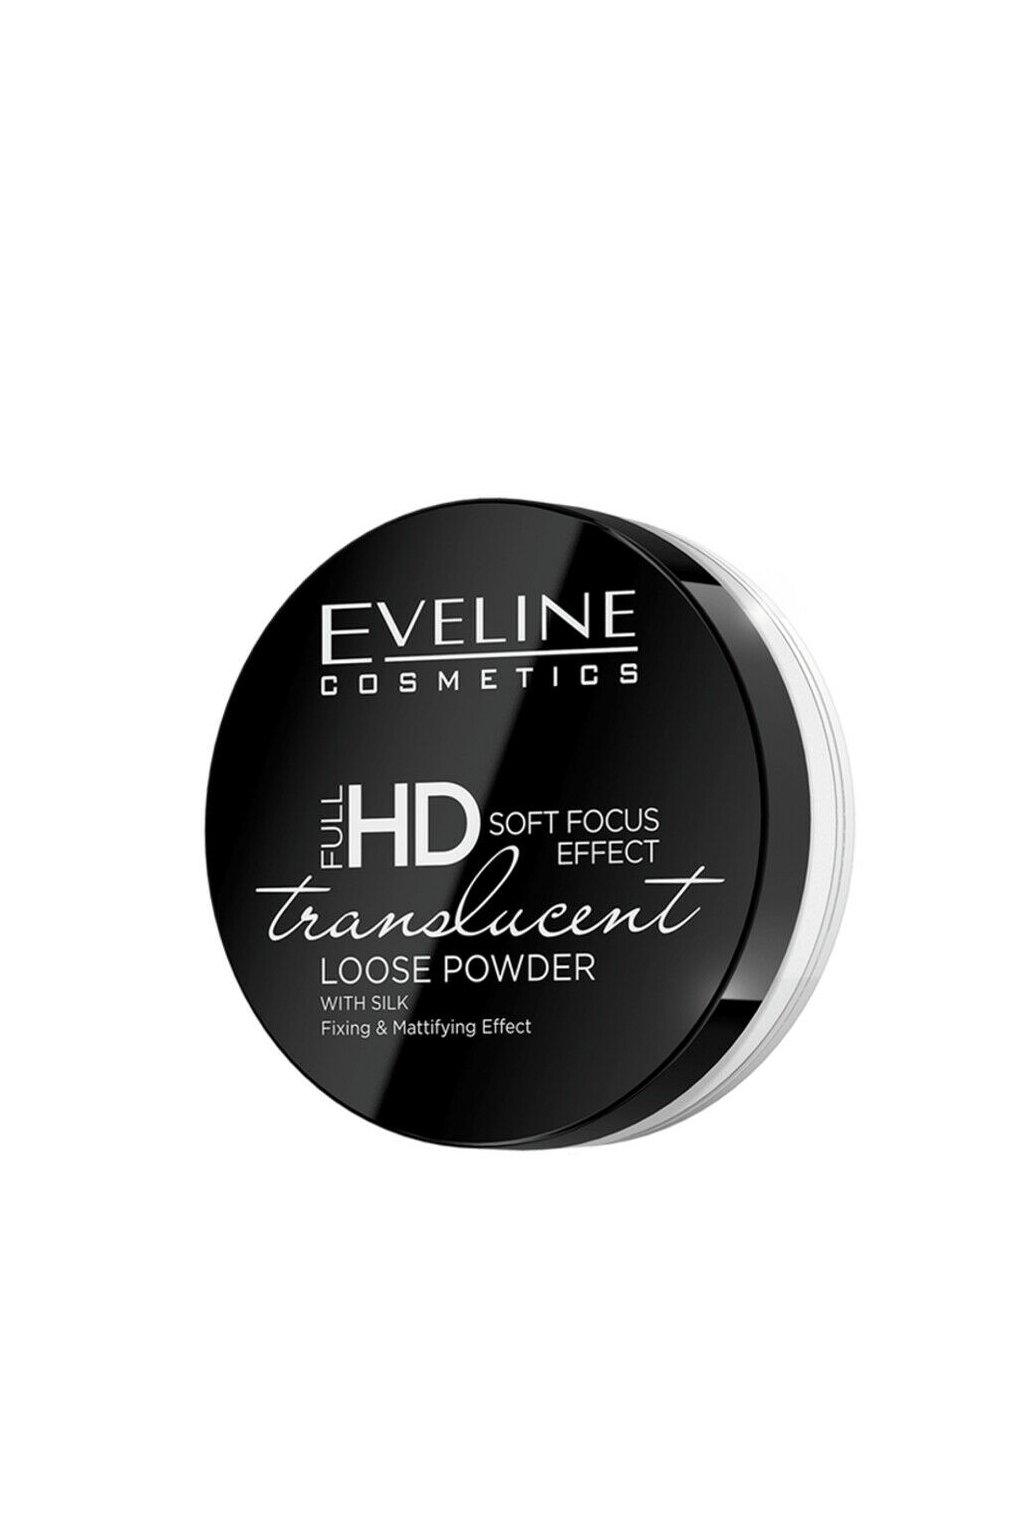 Eveline Cosmetics Full HD Translucent White Powder pudr s hedvabim